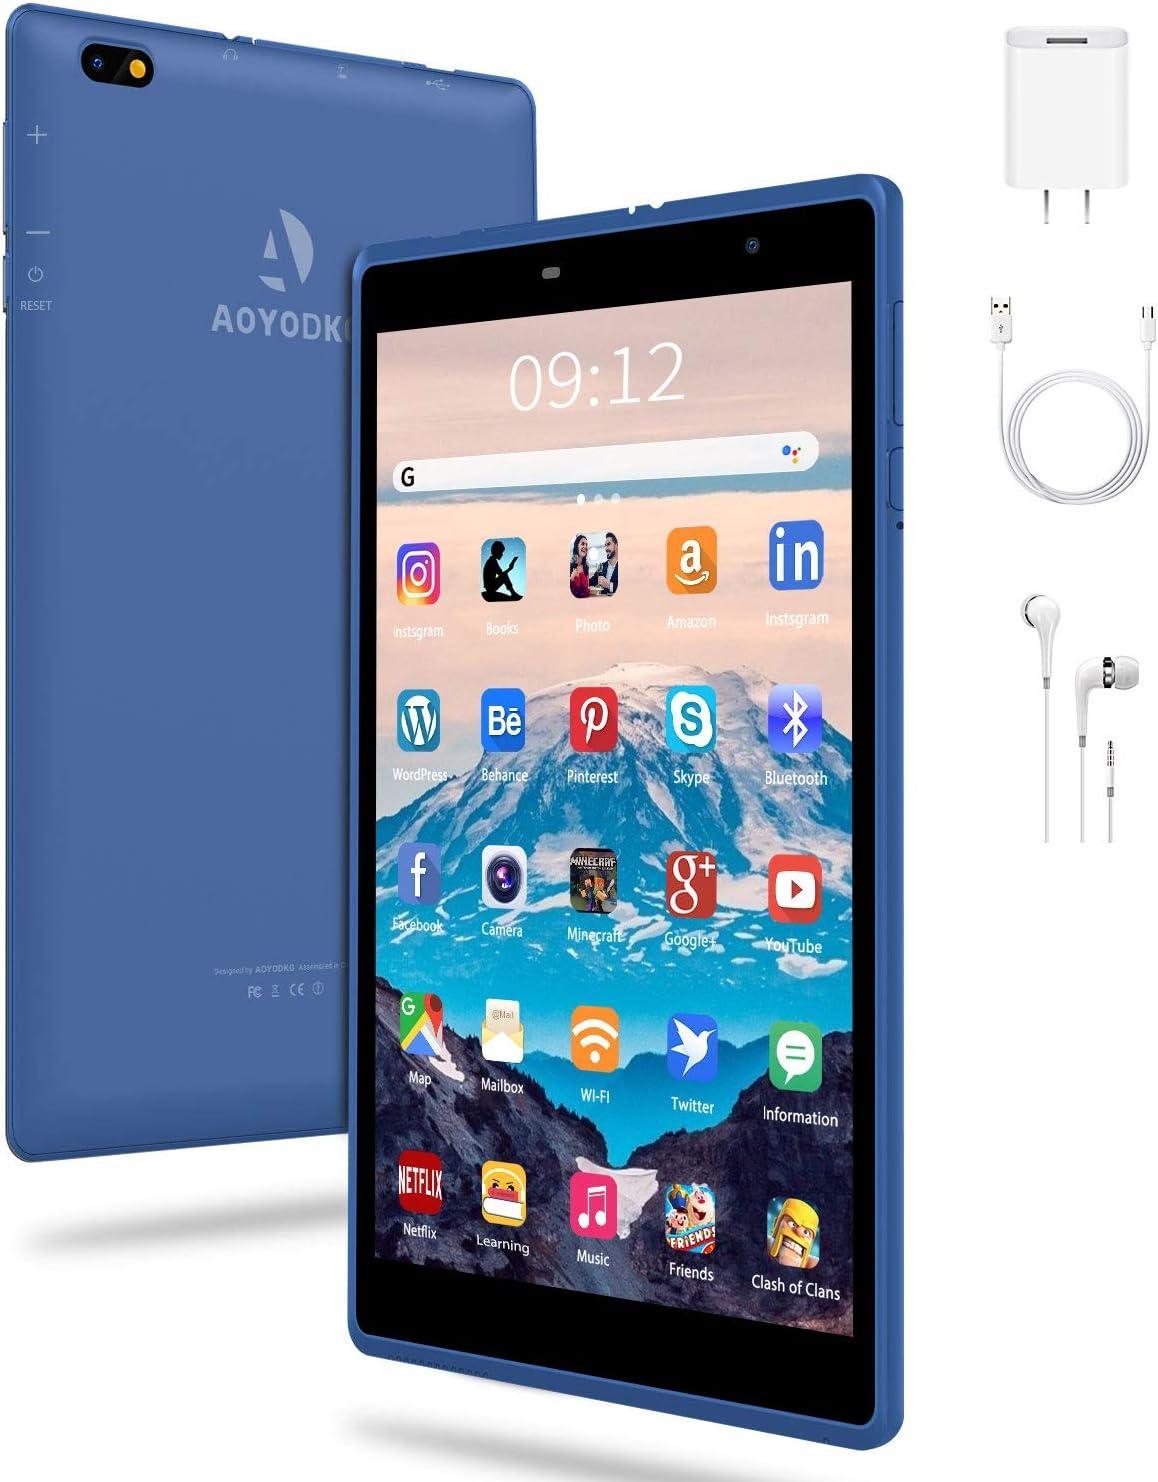 Tablet 8 Pulgadas Android 10 IPS Ultrar-Rápido Tablets HD 1280 * 800 Quad Core 3GB RAM 32GB/128GB ROM WiFi GPS 5000mAh Bluetooth 4.2-Certificación Google GMS (Azul)